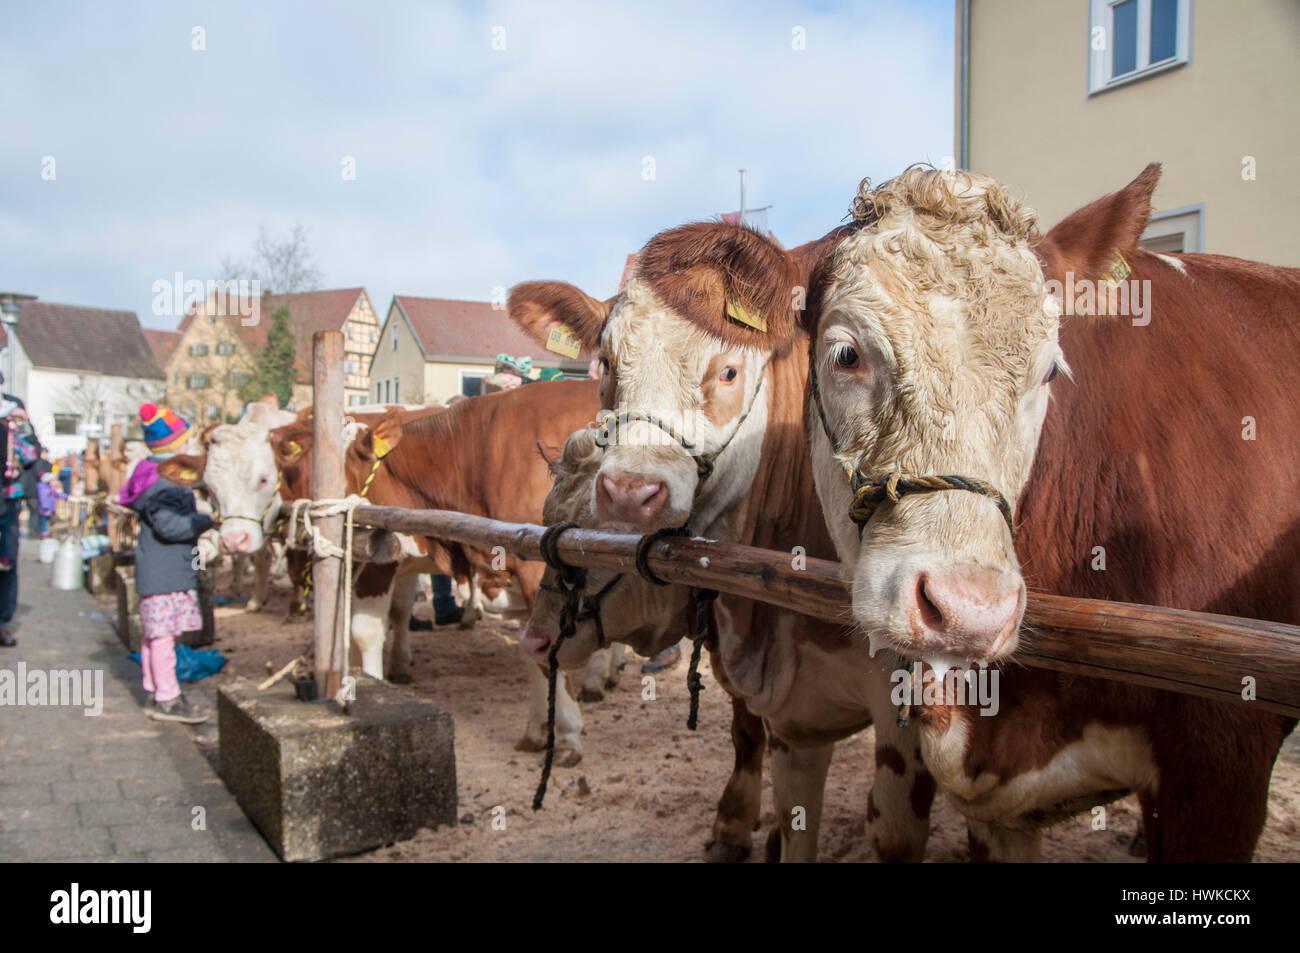 city festival and cattle award, kirchberg, jagst valley, Schwaebisch Hall, Hohenlohe region, Baden-Wuerttemberg, - Stock Image